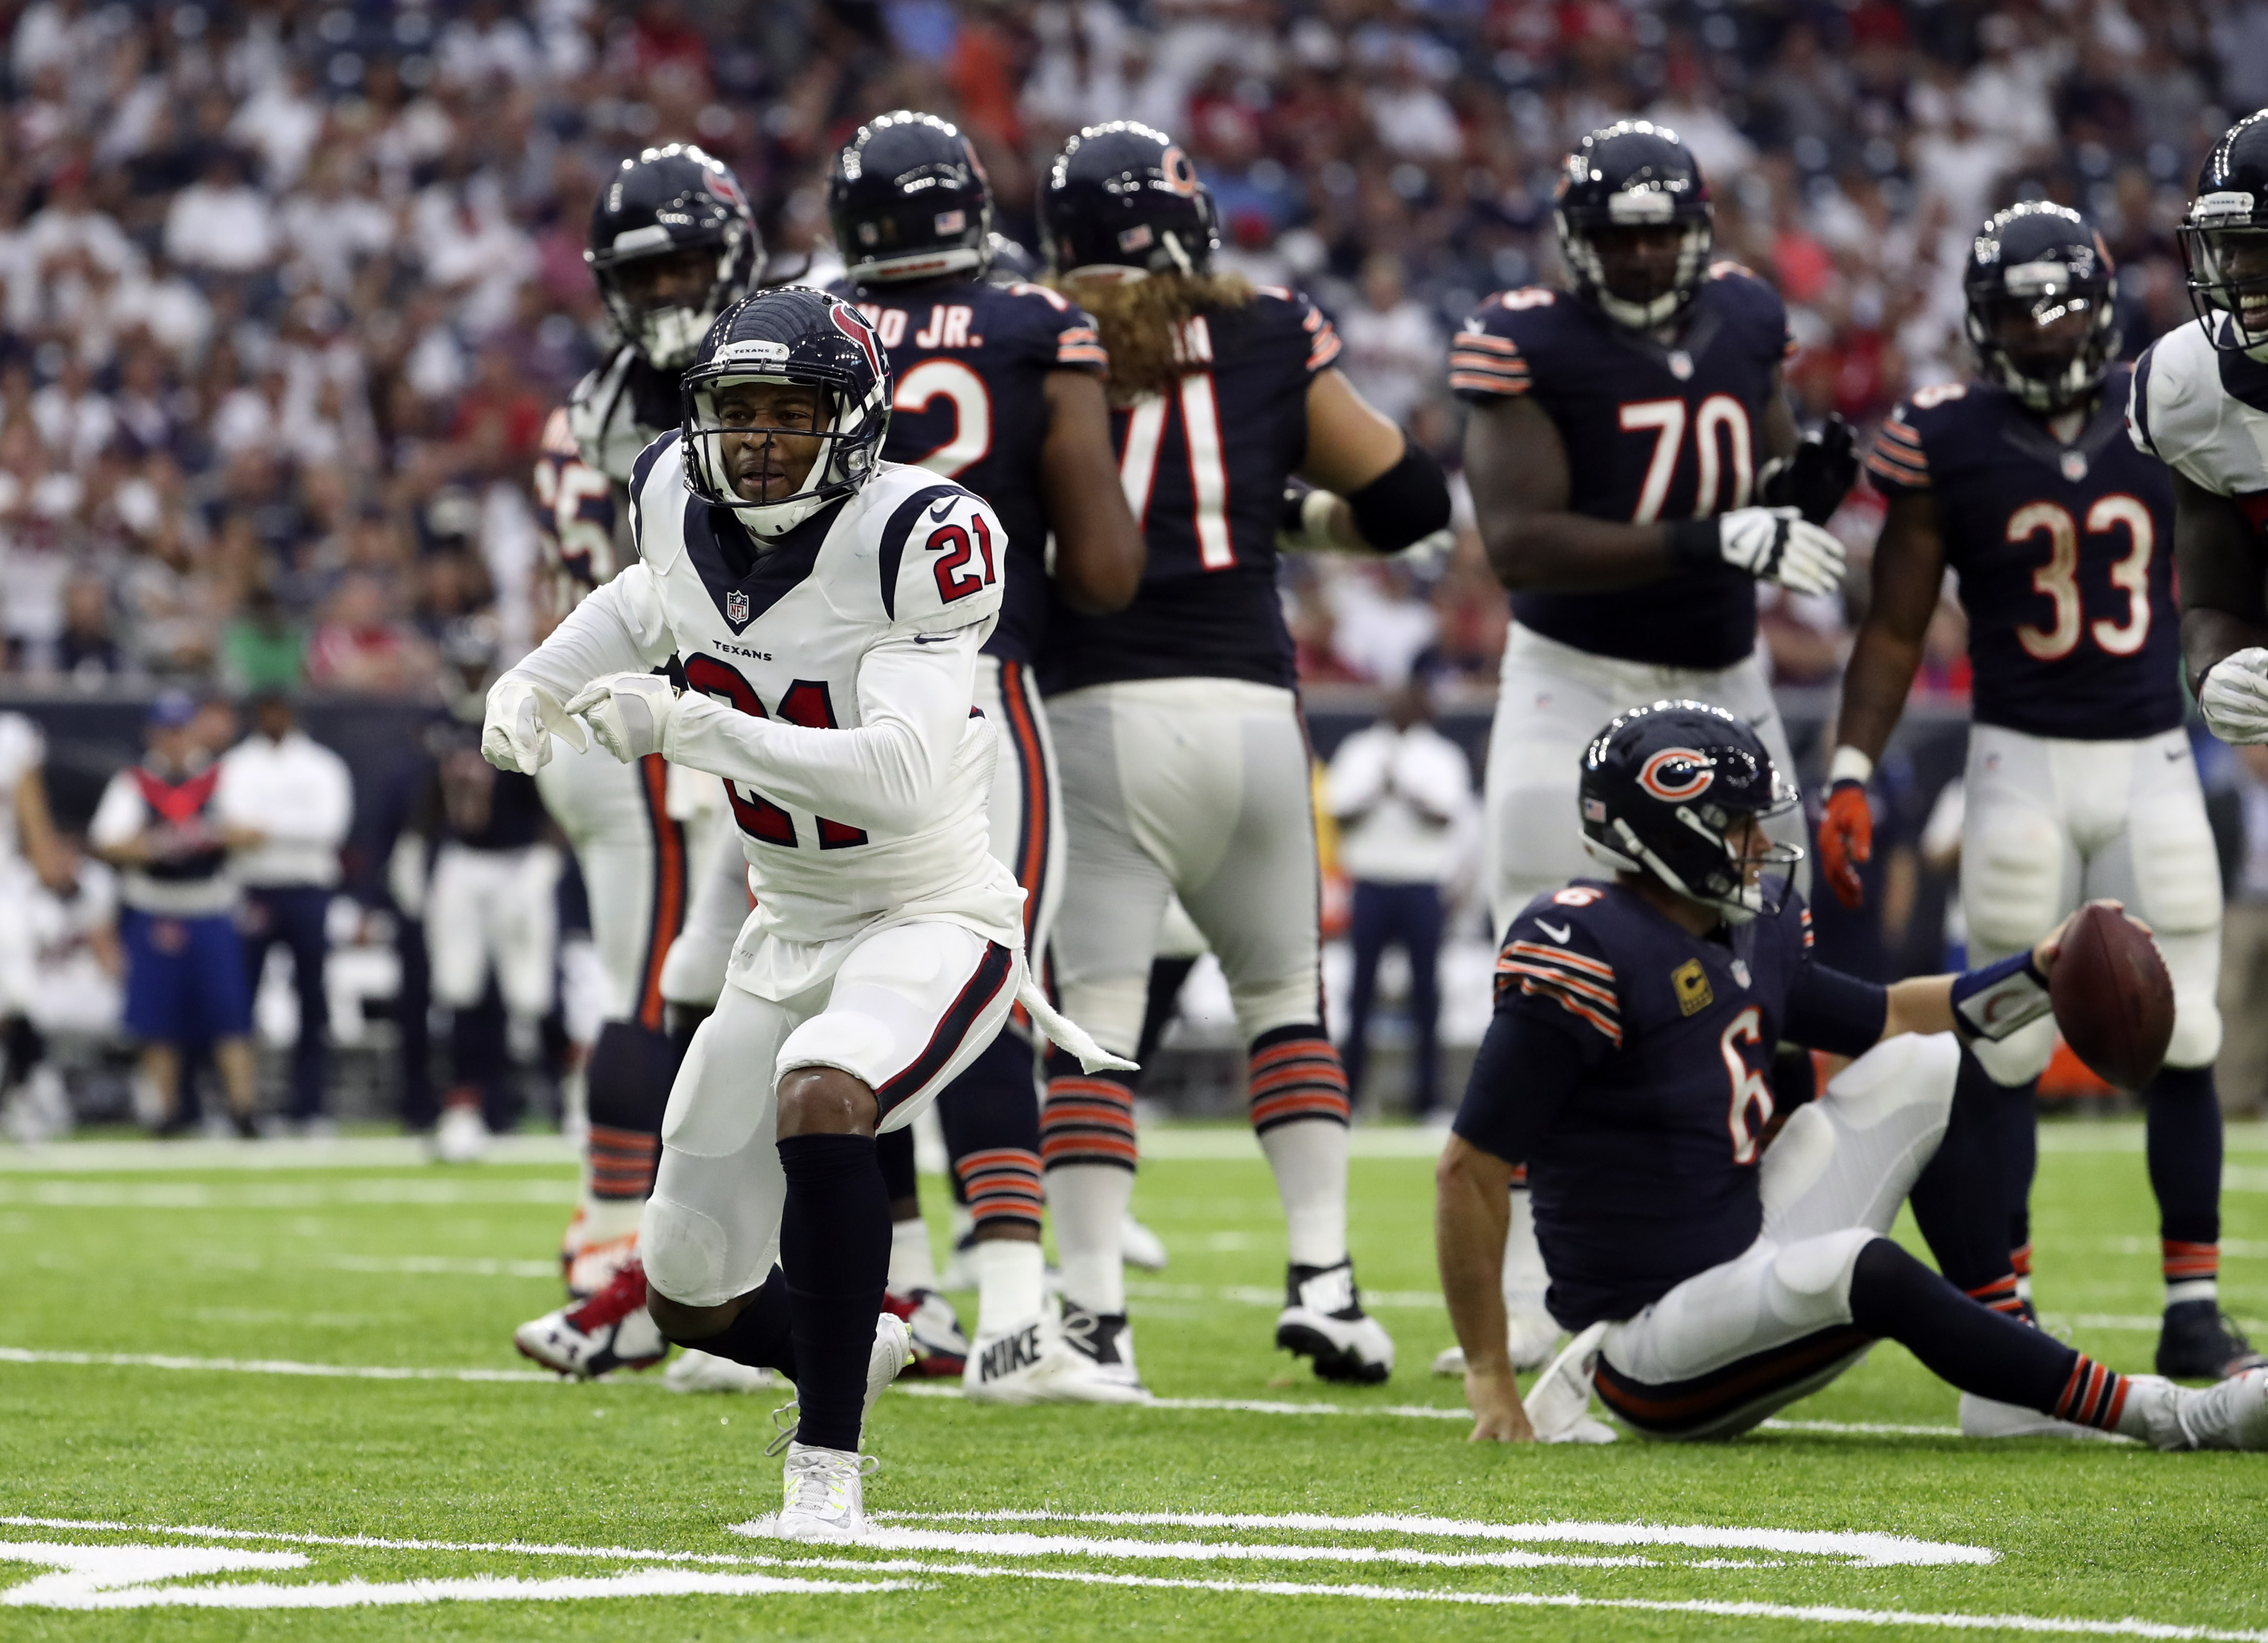 Chicago Bears plete Mock f Season Free Agency and 2017 NFL